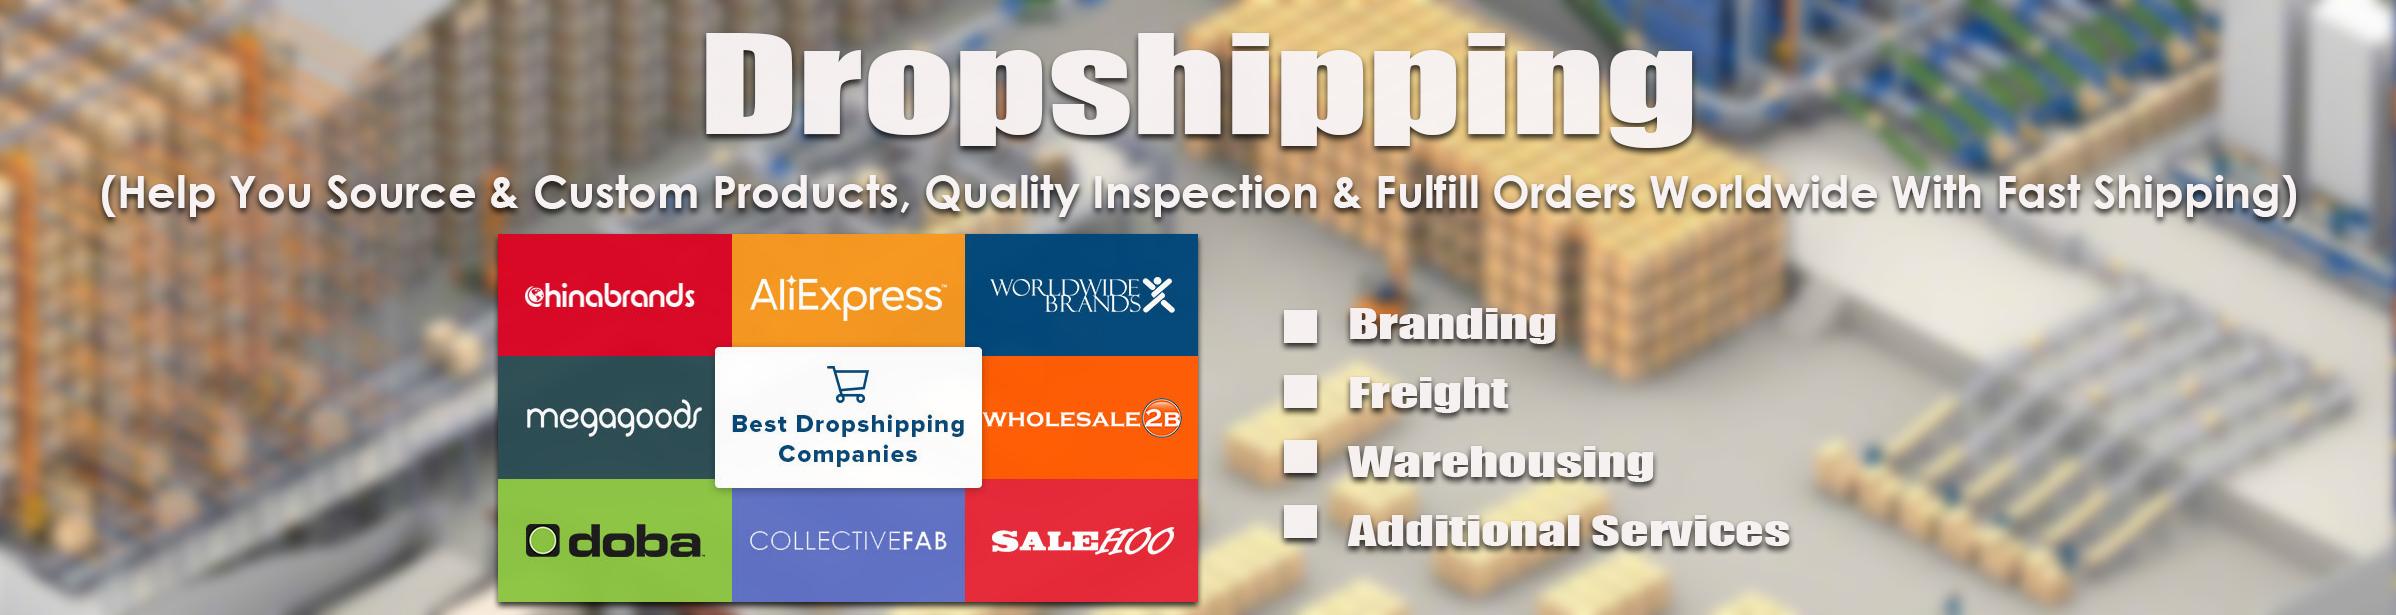 dropshipping service